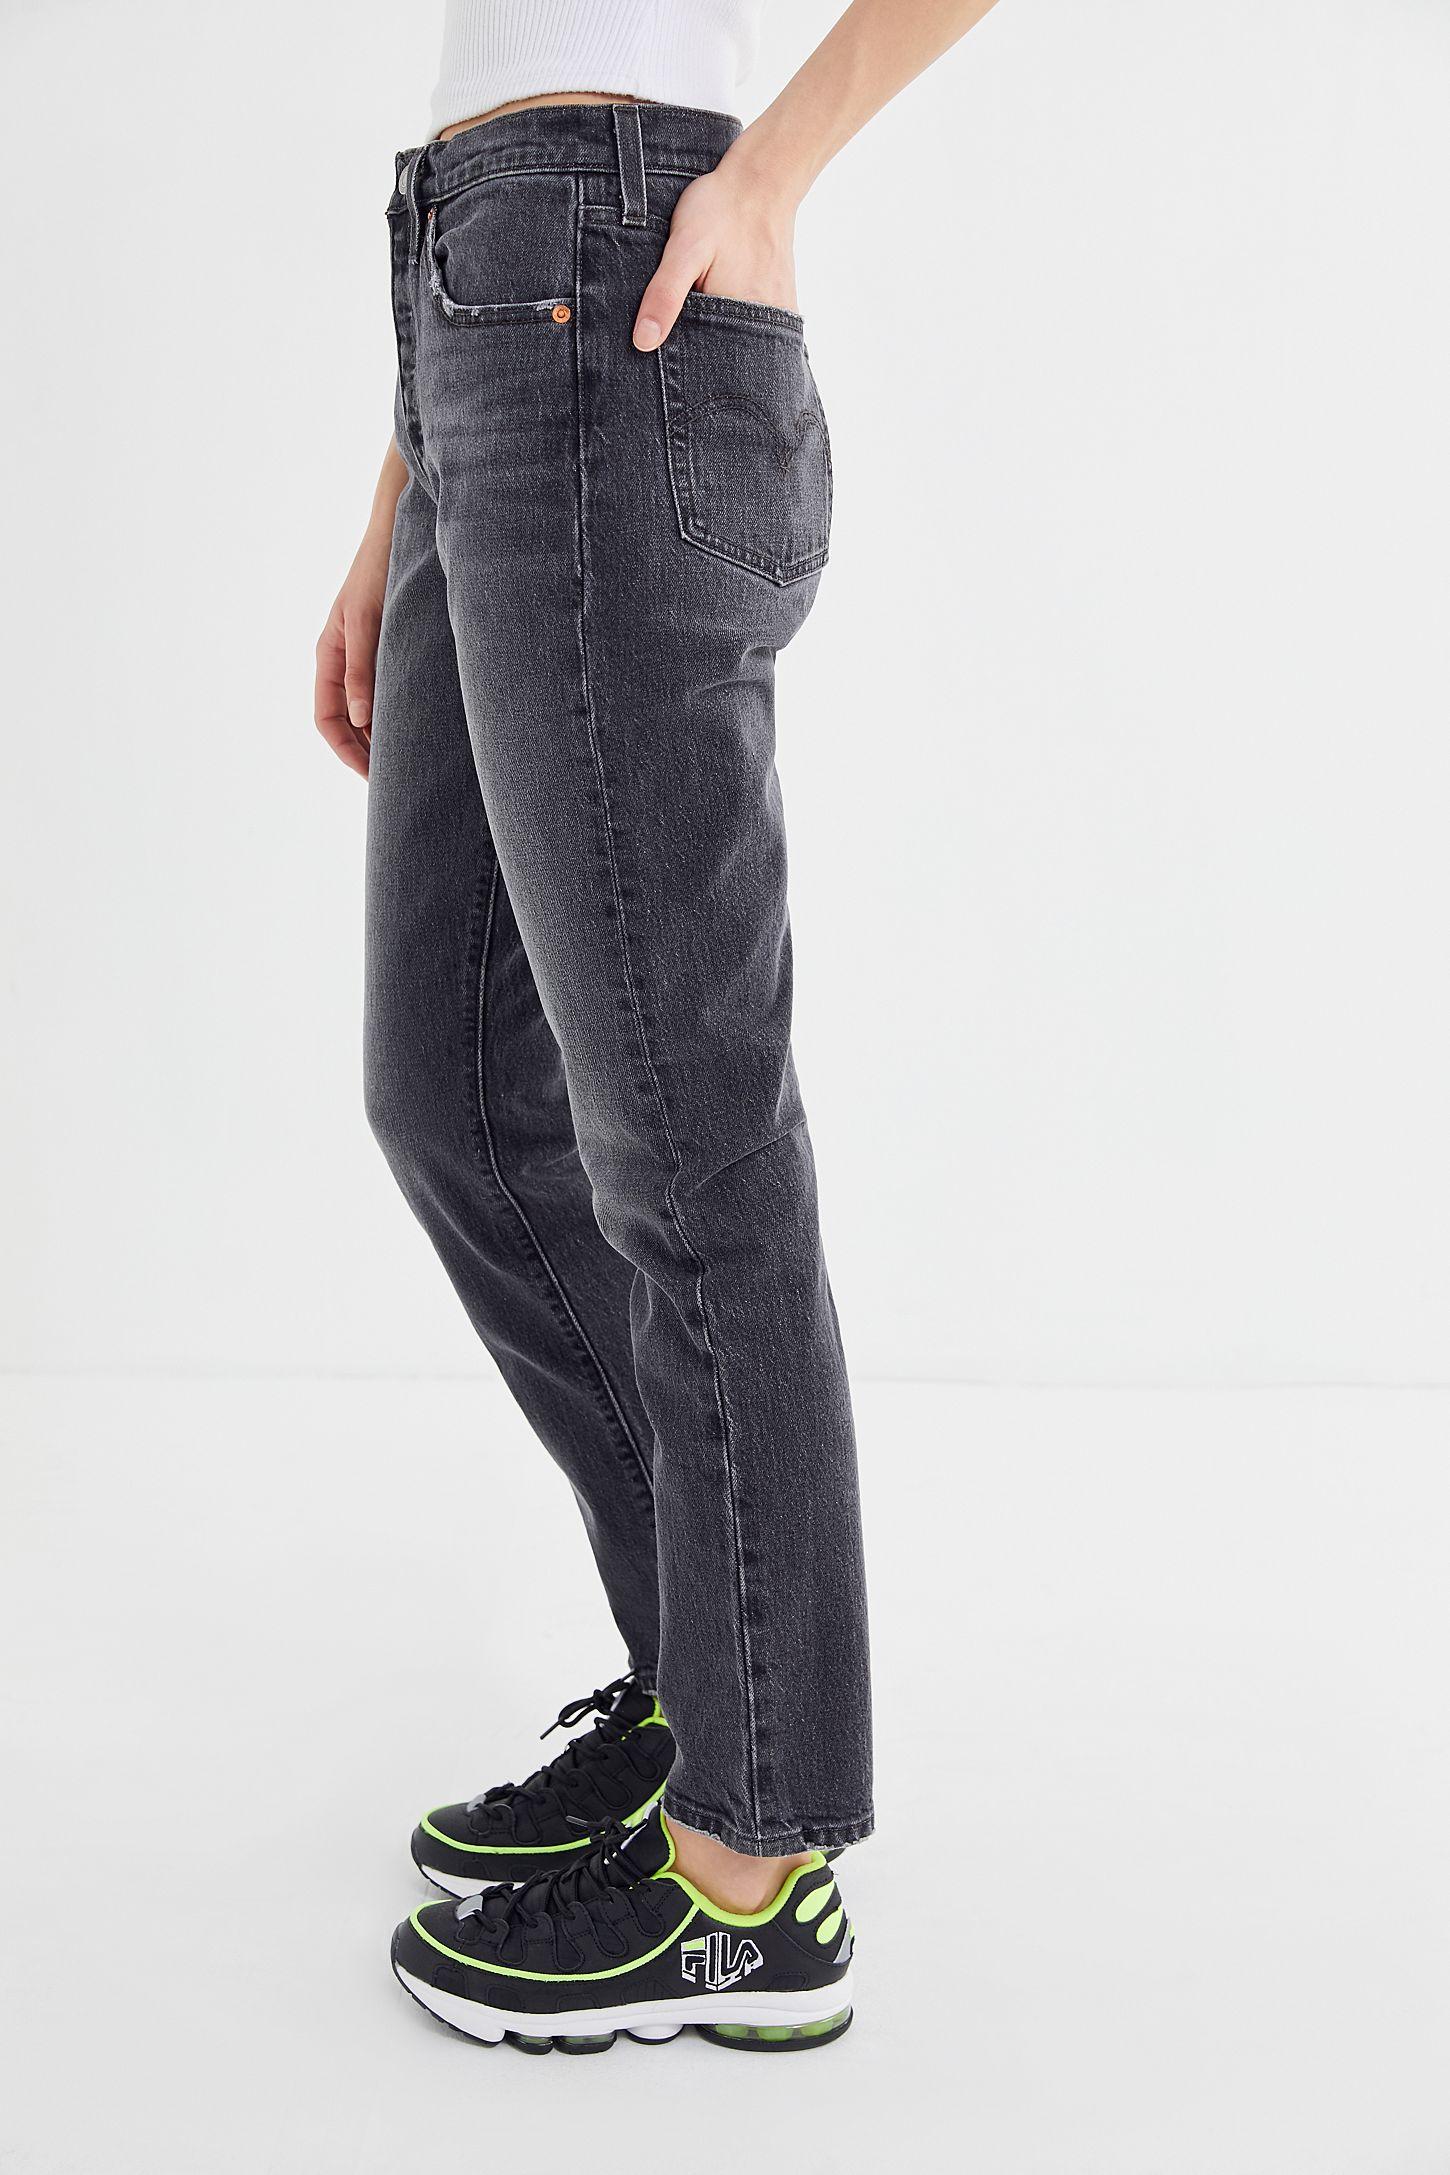 52eda746d09c Levi's 501 Skinny Jean – Coal Black | Urban Outfitters